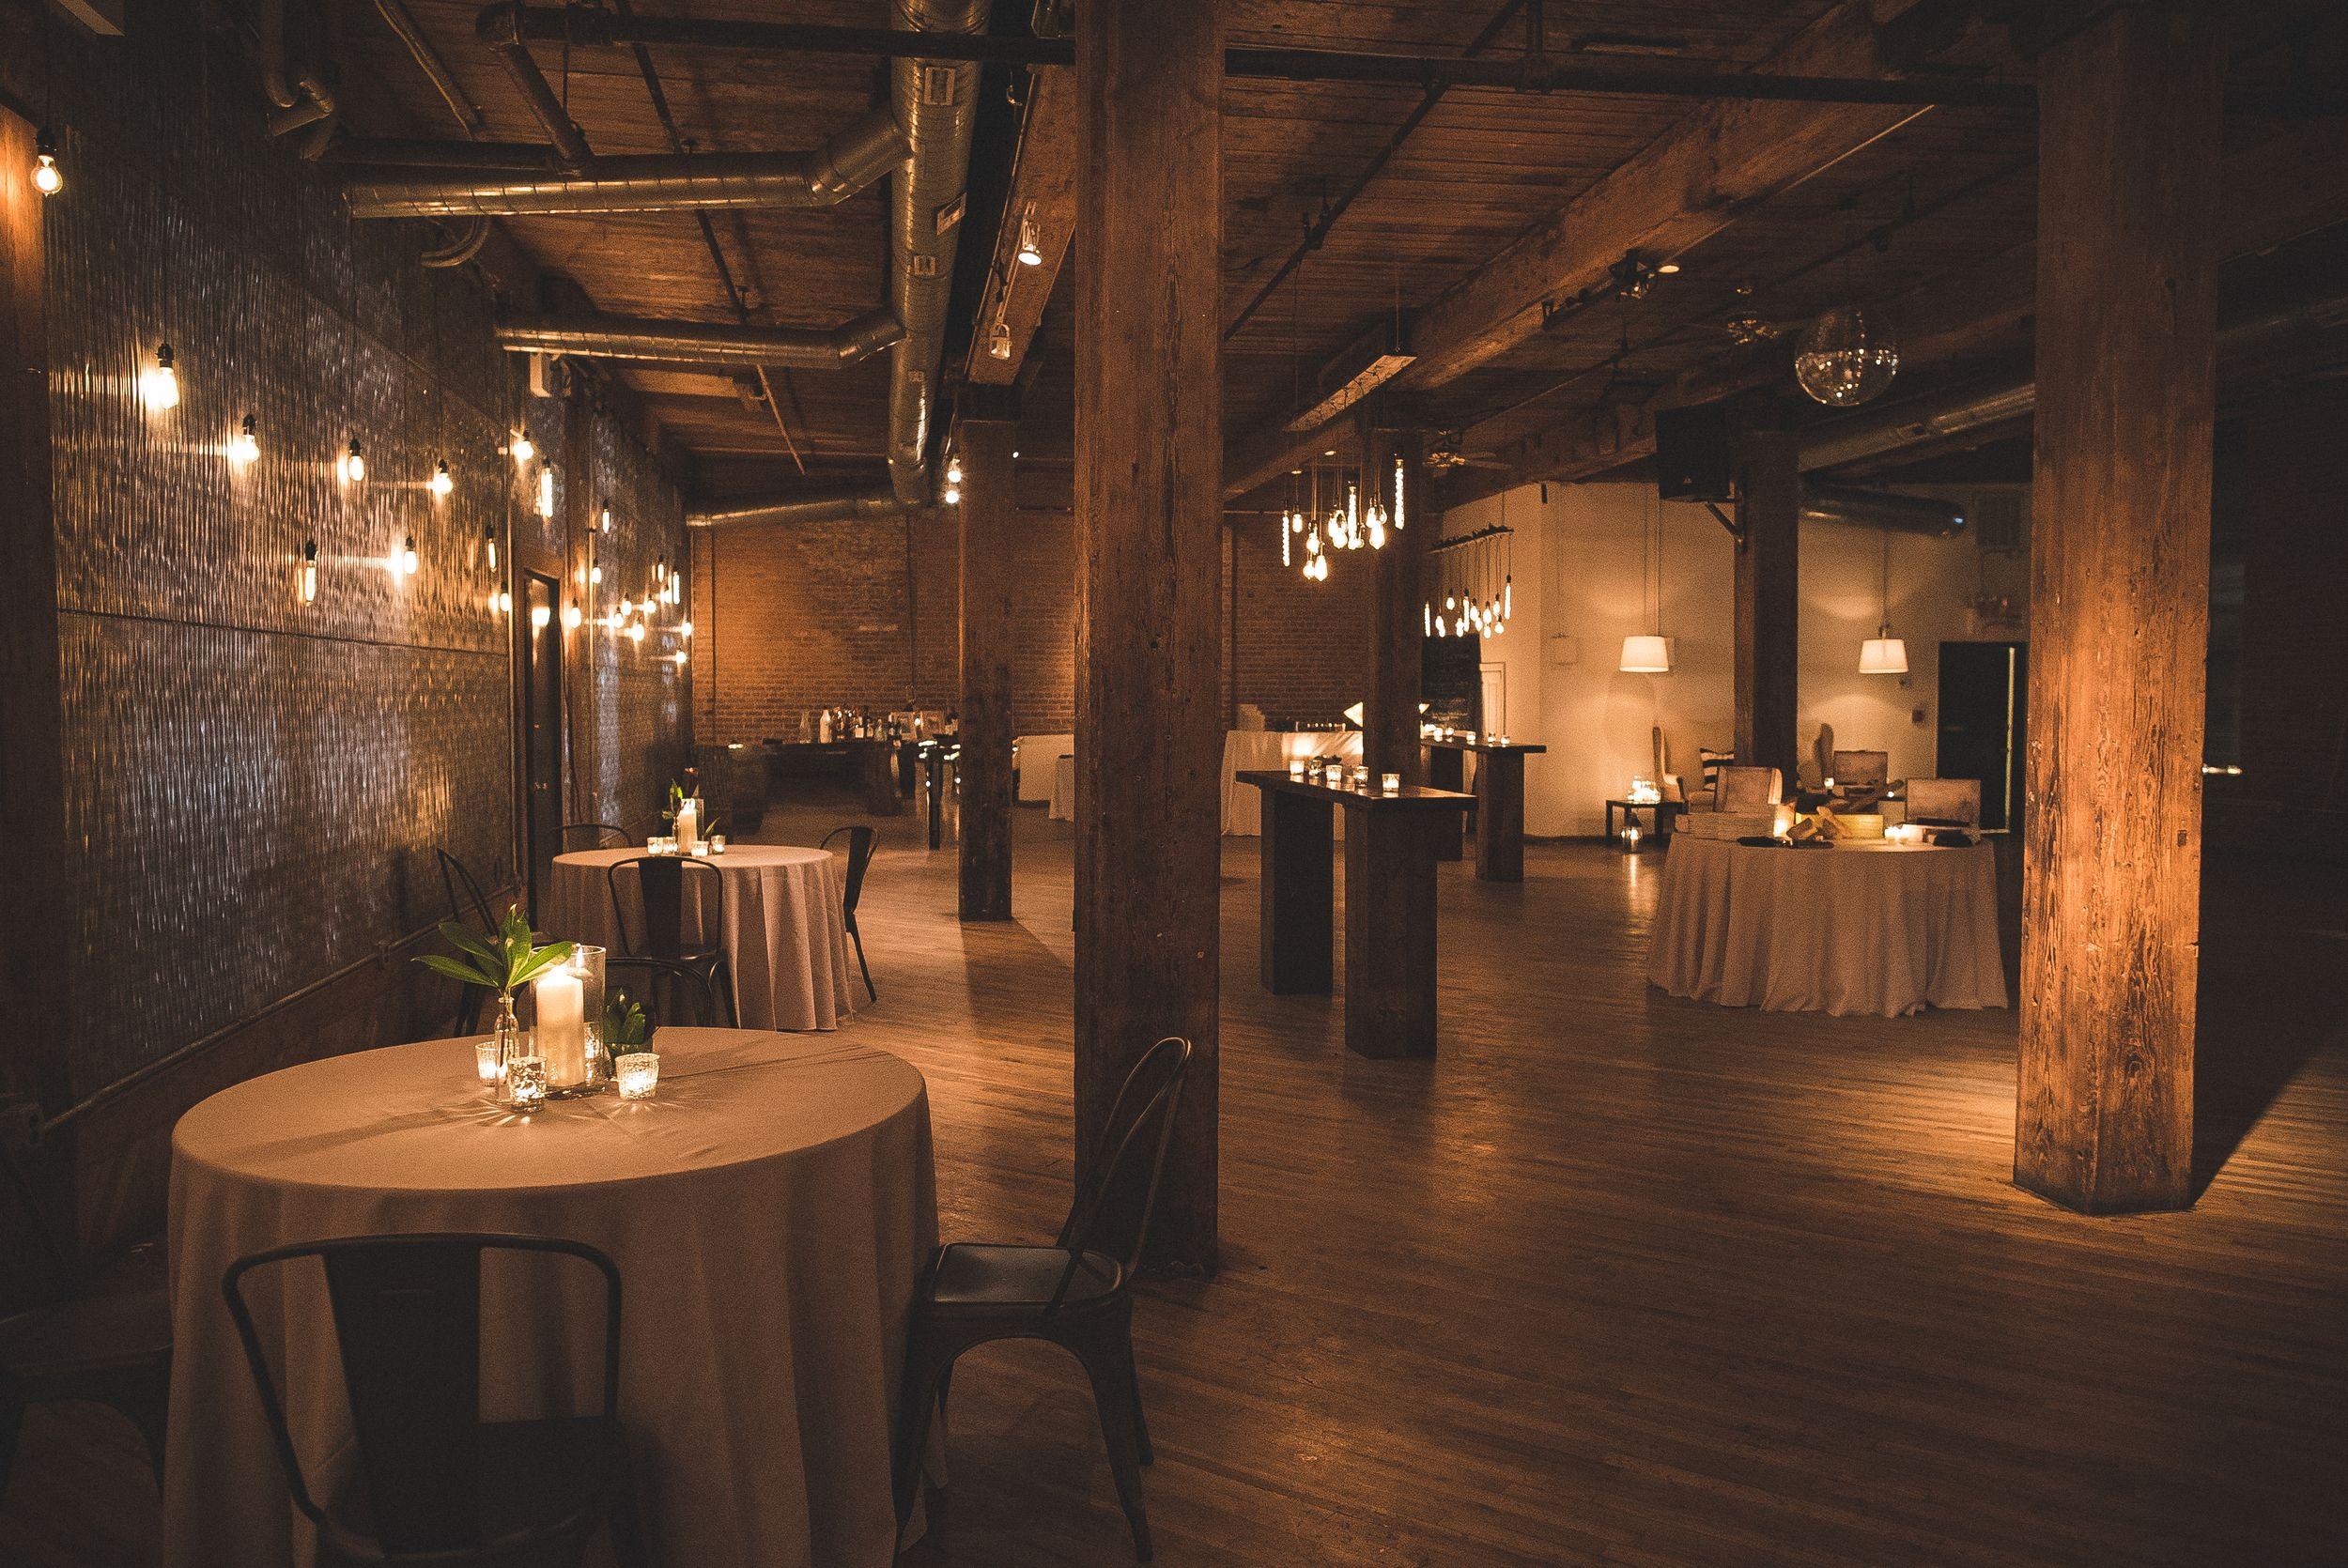 Rw Dumbo Loft Event Planning Event Planning Tips Wedding Planning